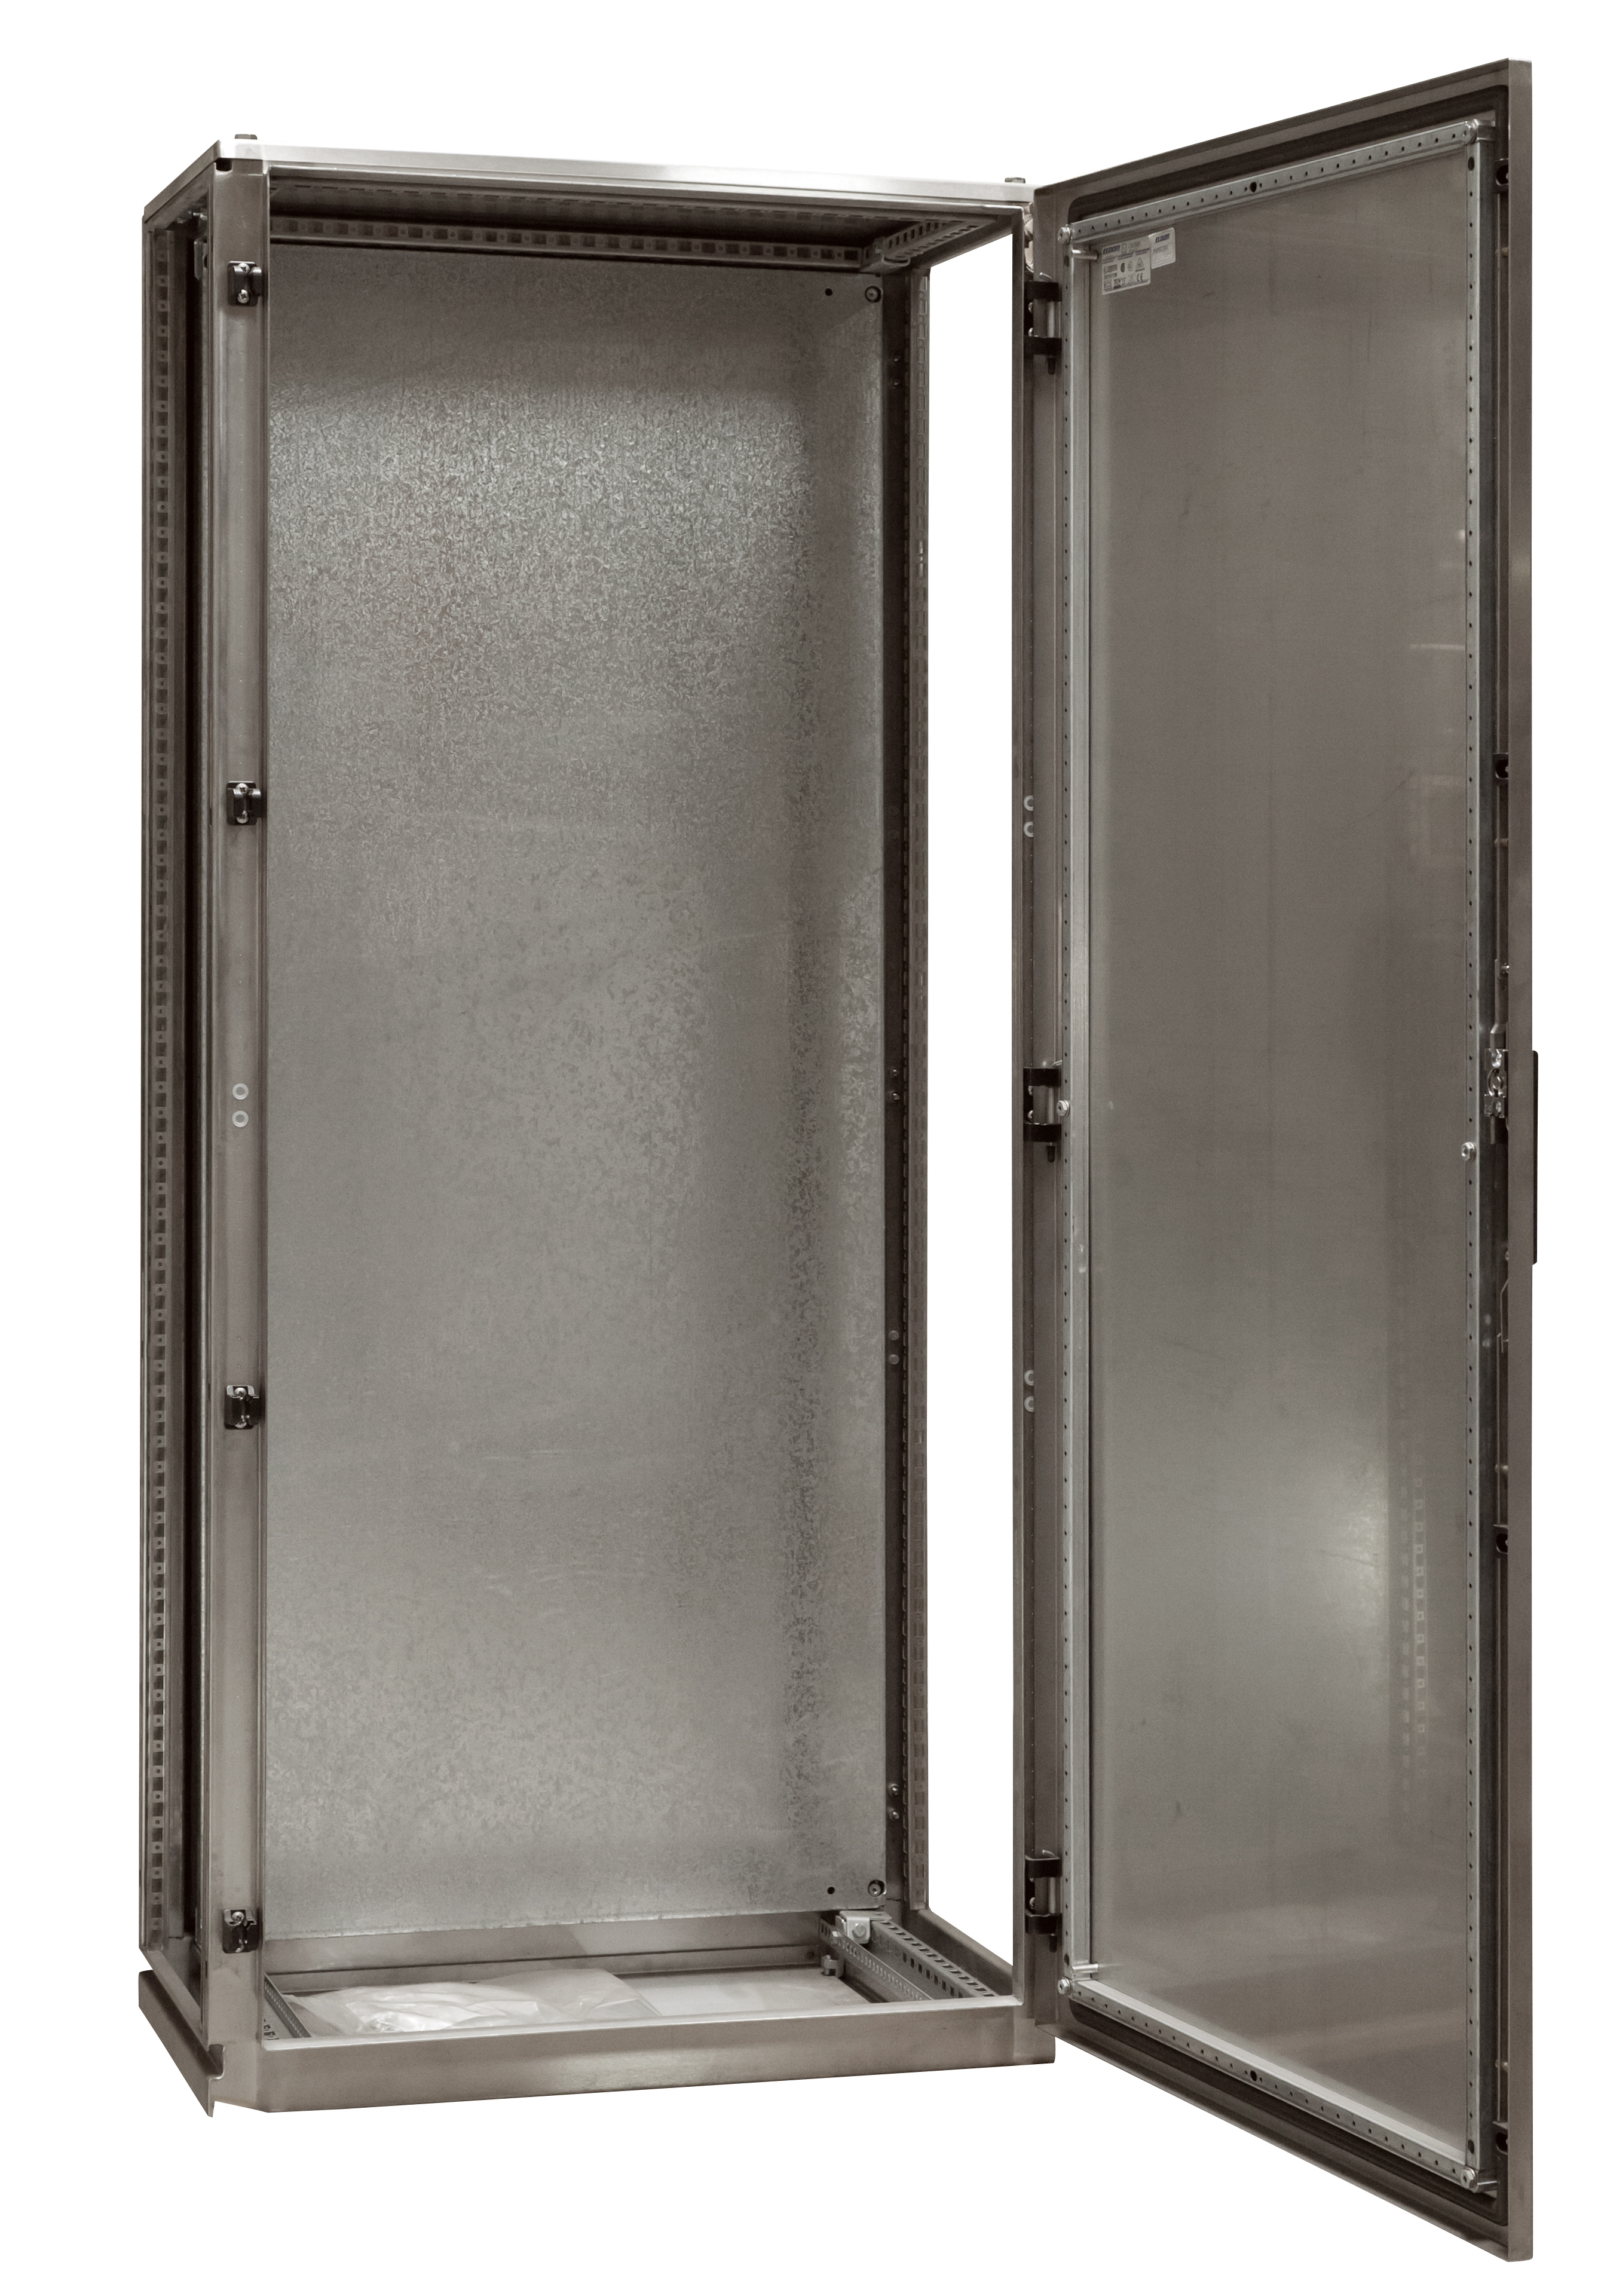 1 Stk Anreihschrank Edelstahl 1-türig, 2000x800x600mm, AISI 304L ASR208060-